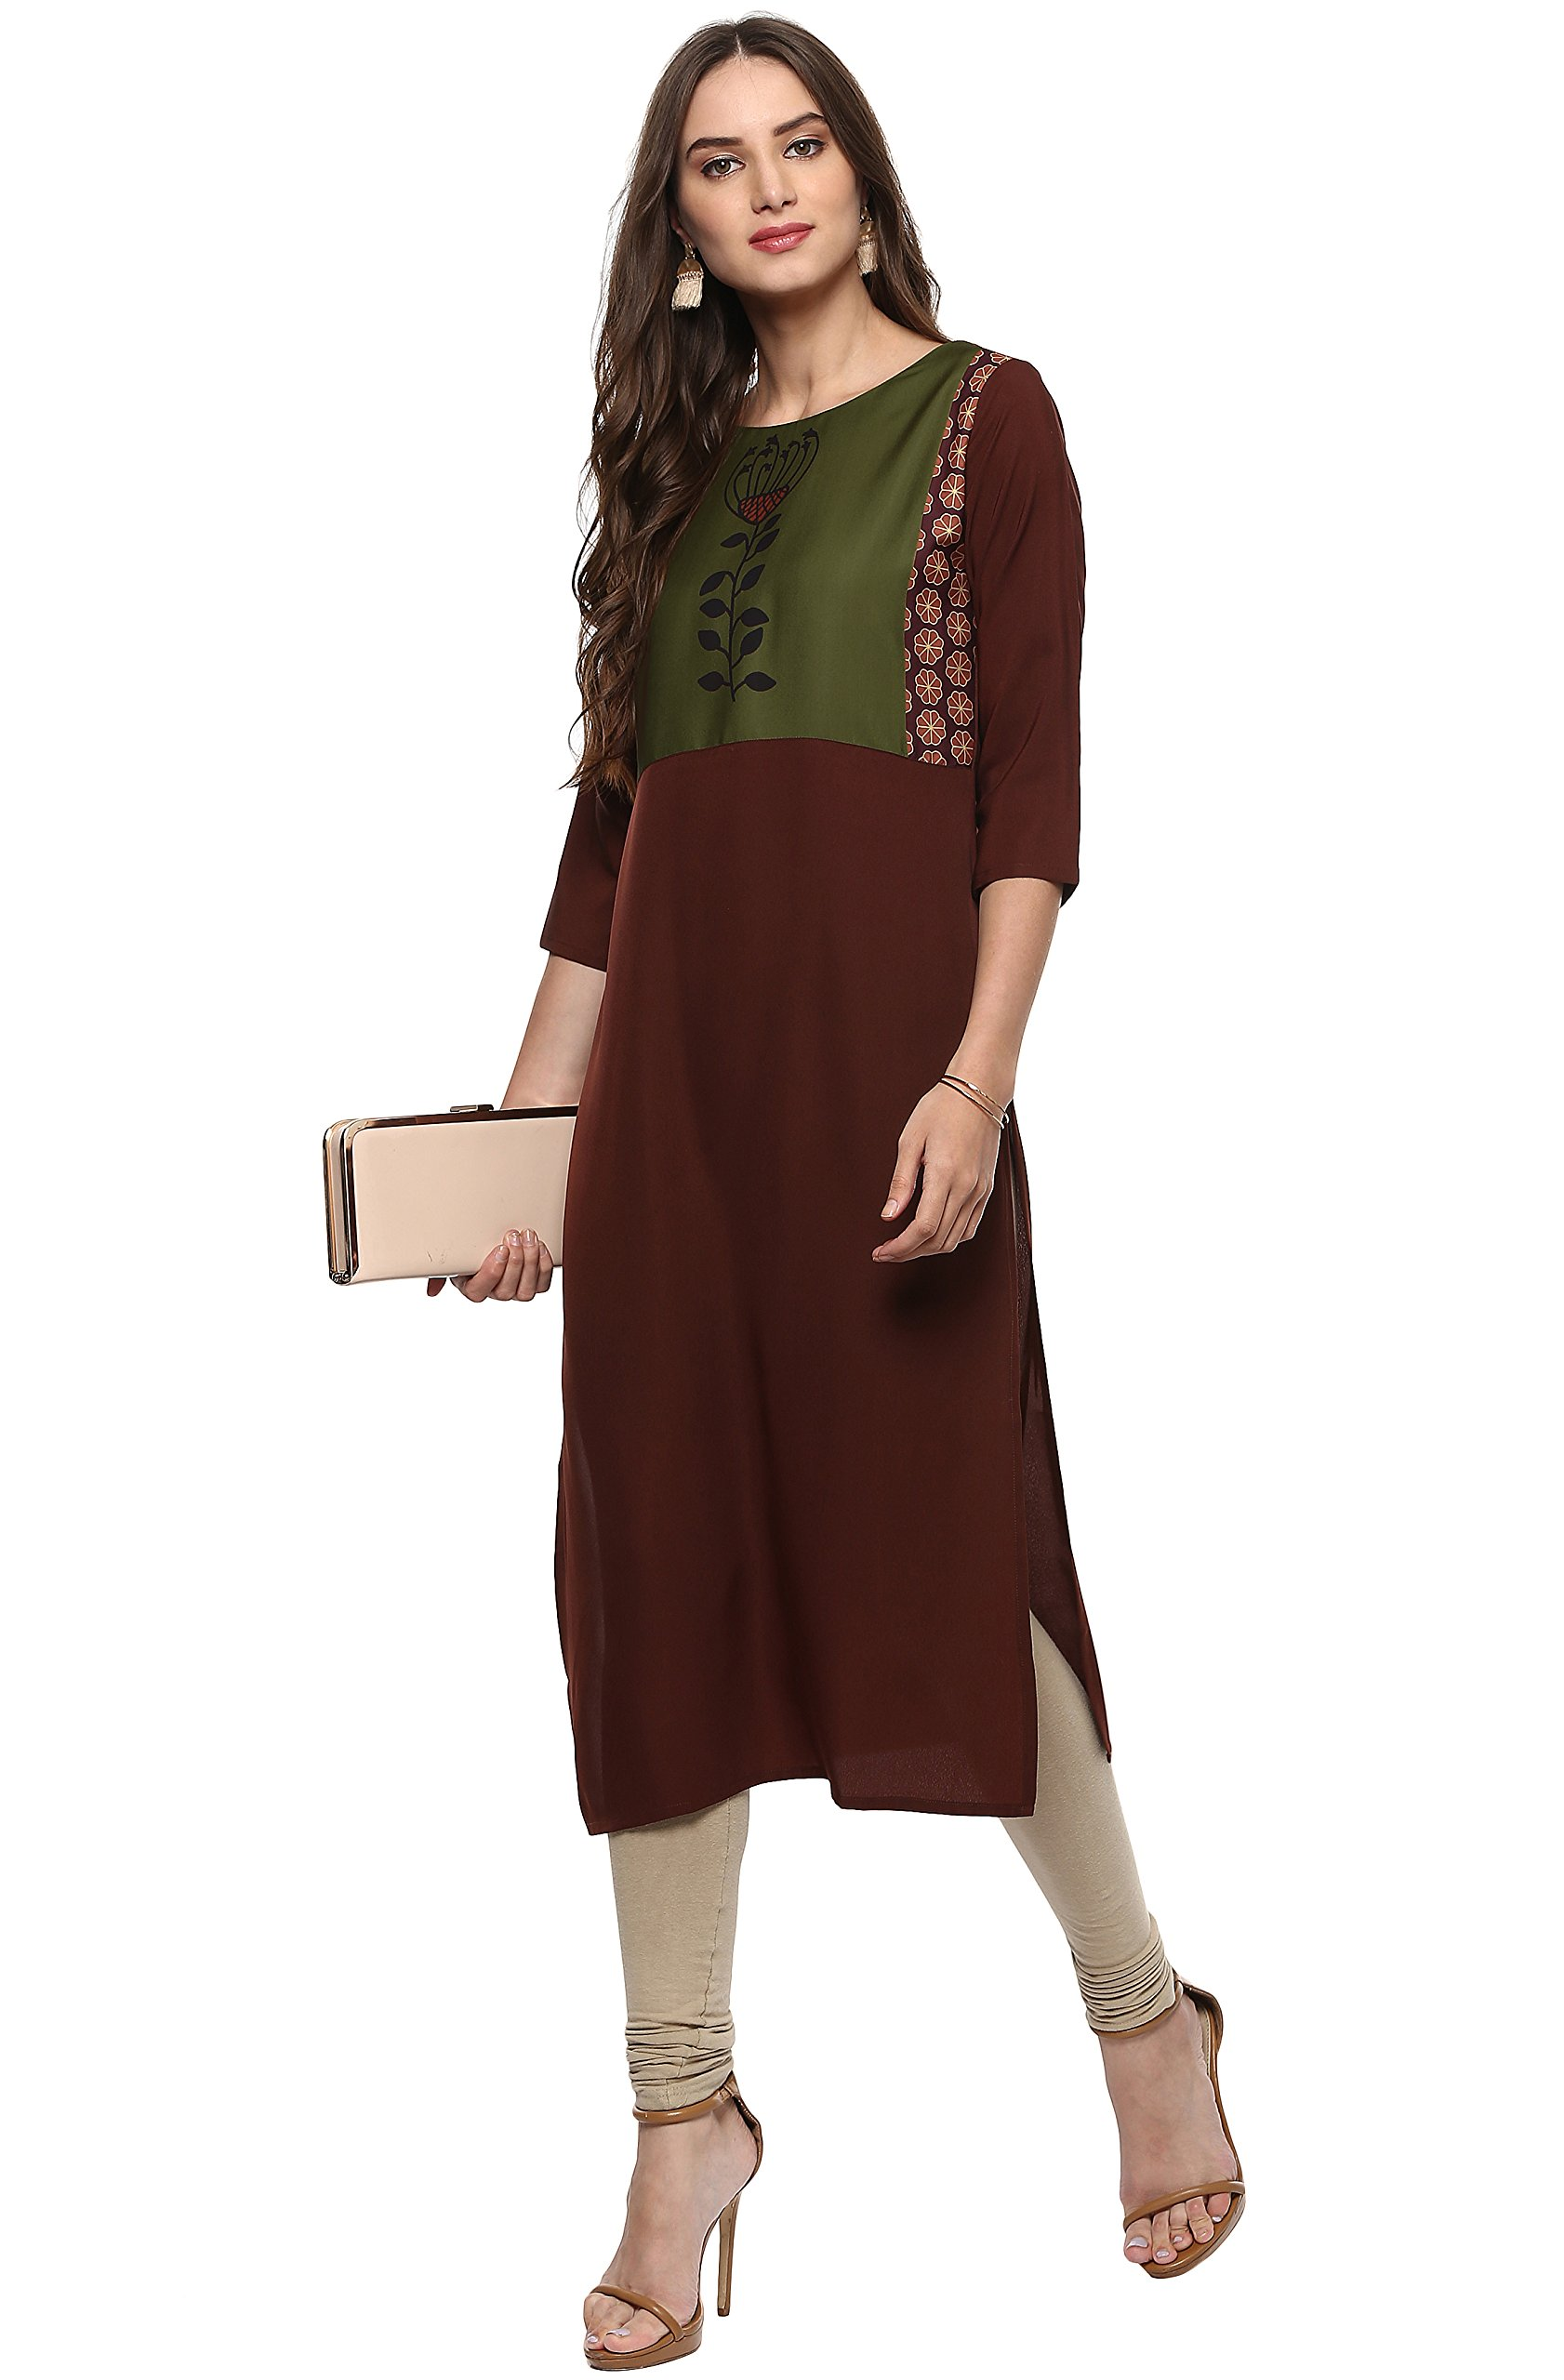 Janasya Indian Tunic Tops Crepe Kurti for Women (JNE2009-KR-310-XXL)